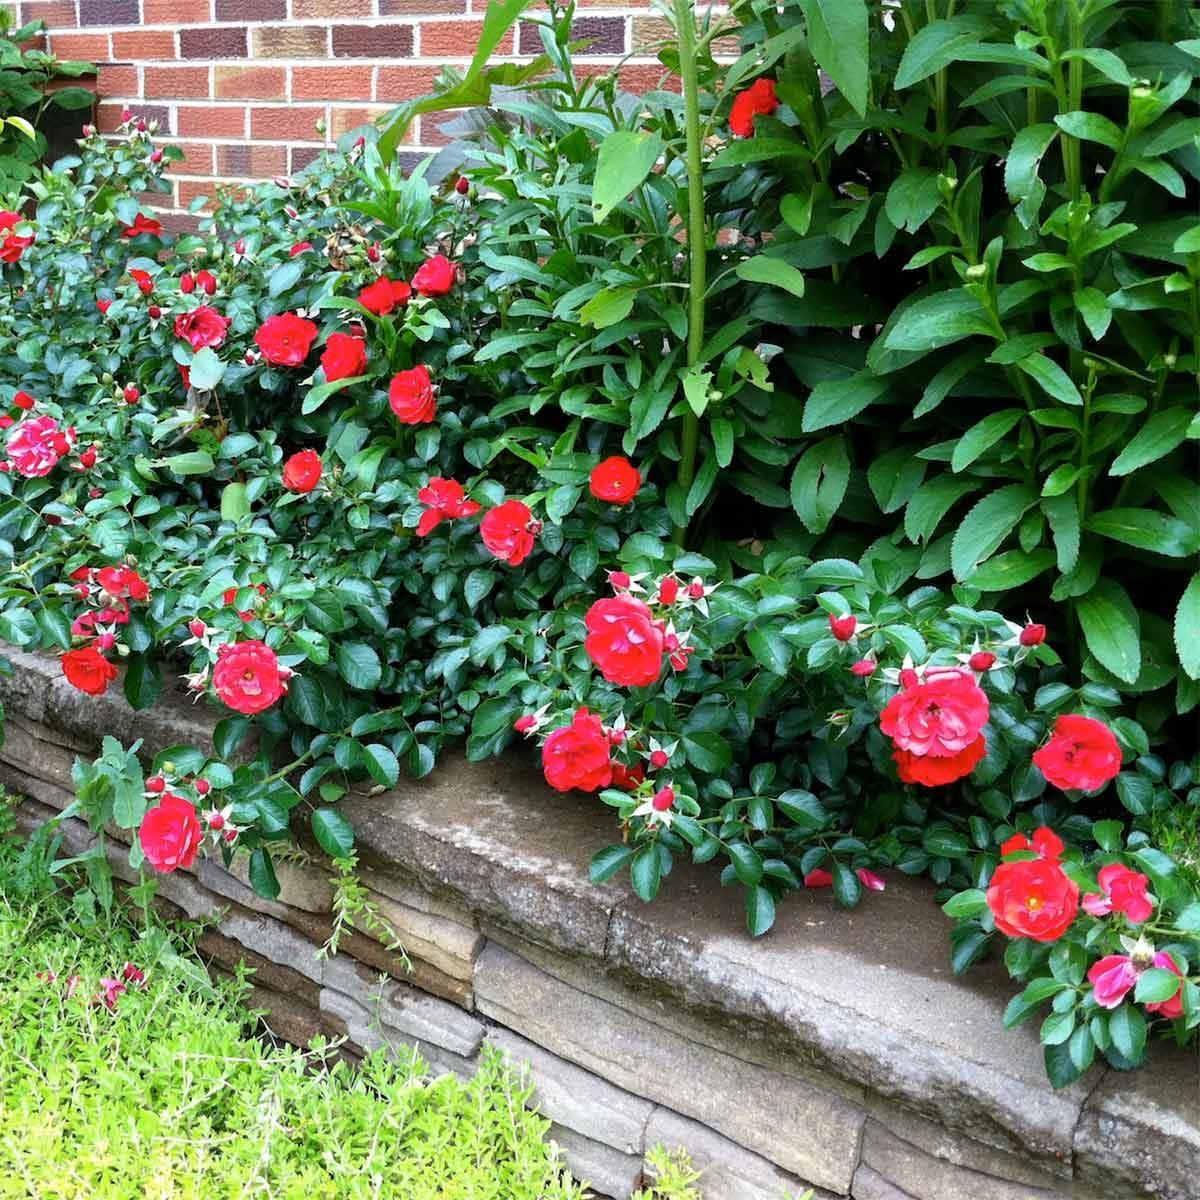 Groundcover Roses and Sedum